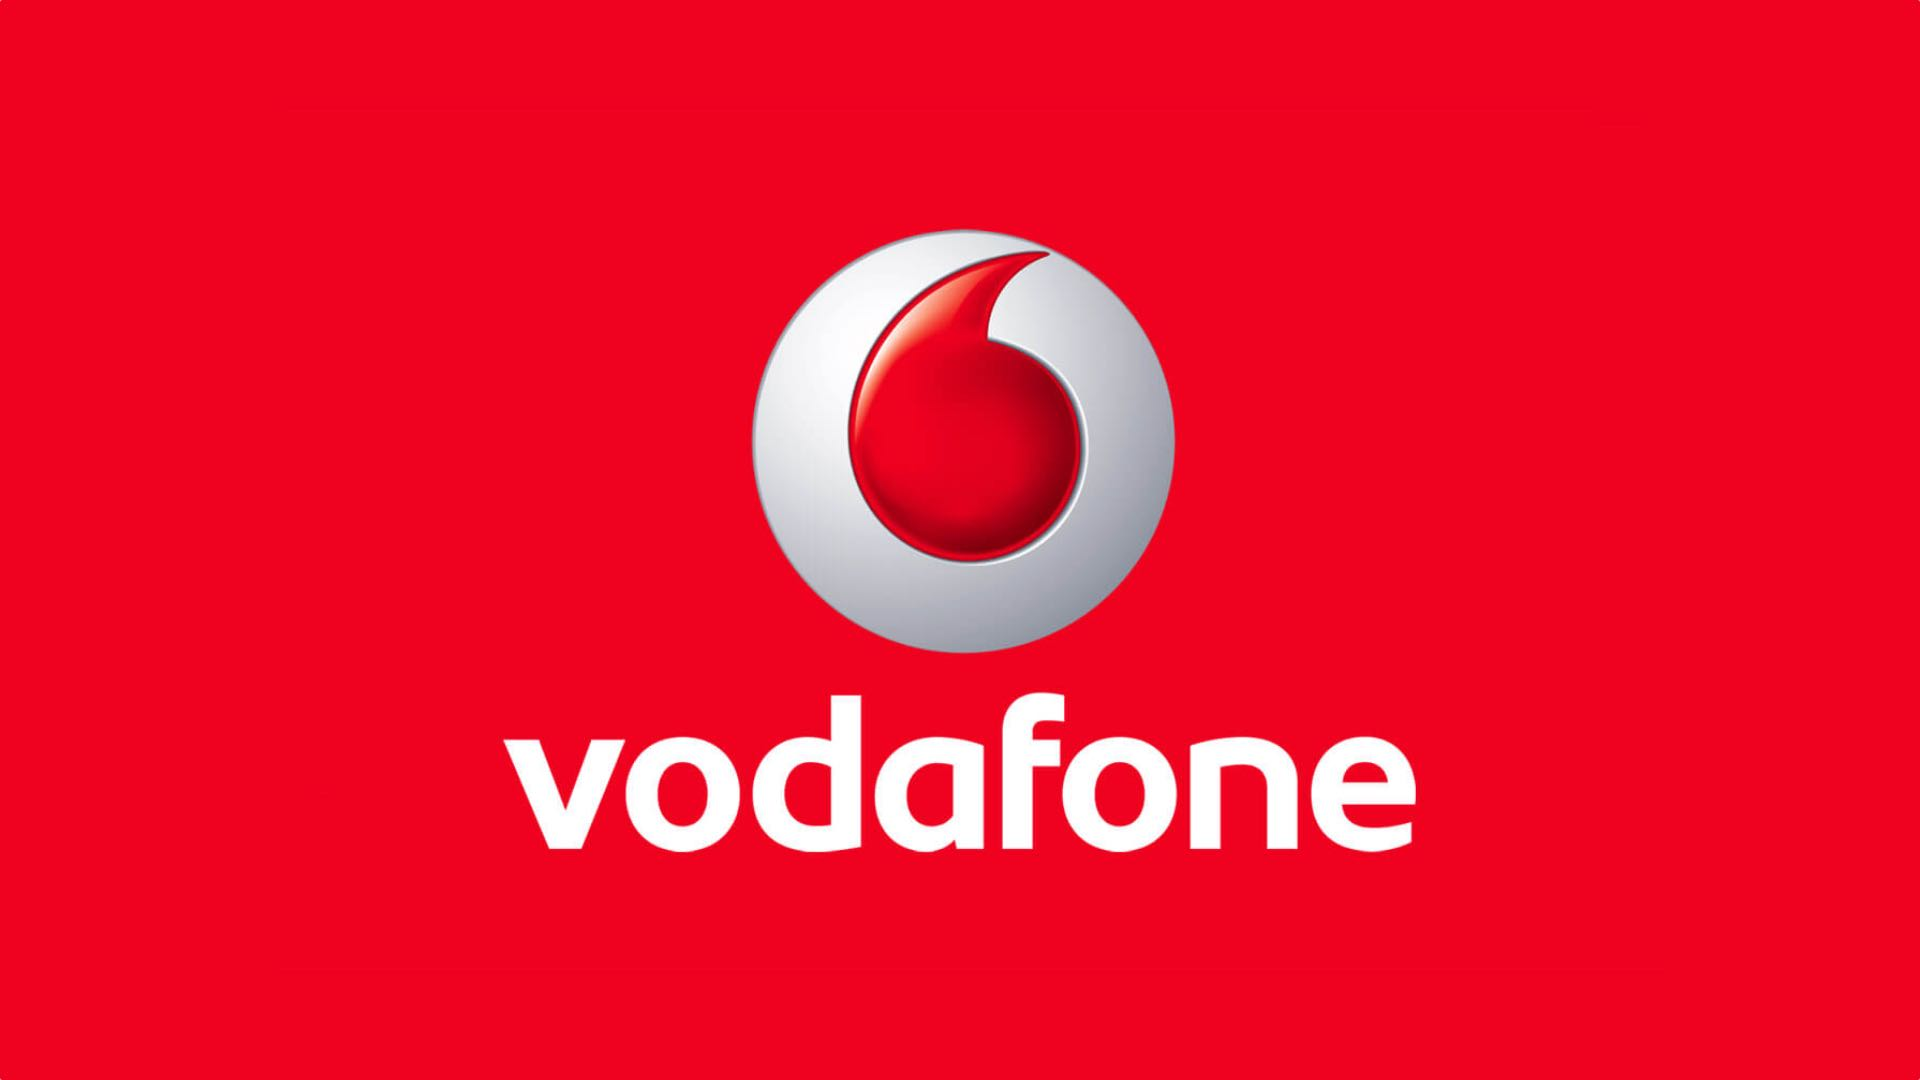 Vodafone 4G LTE 900 МГц